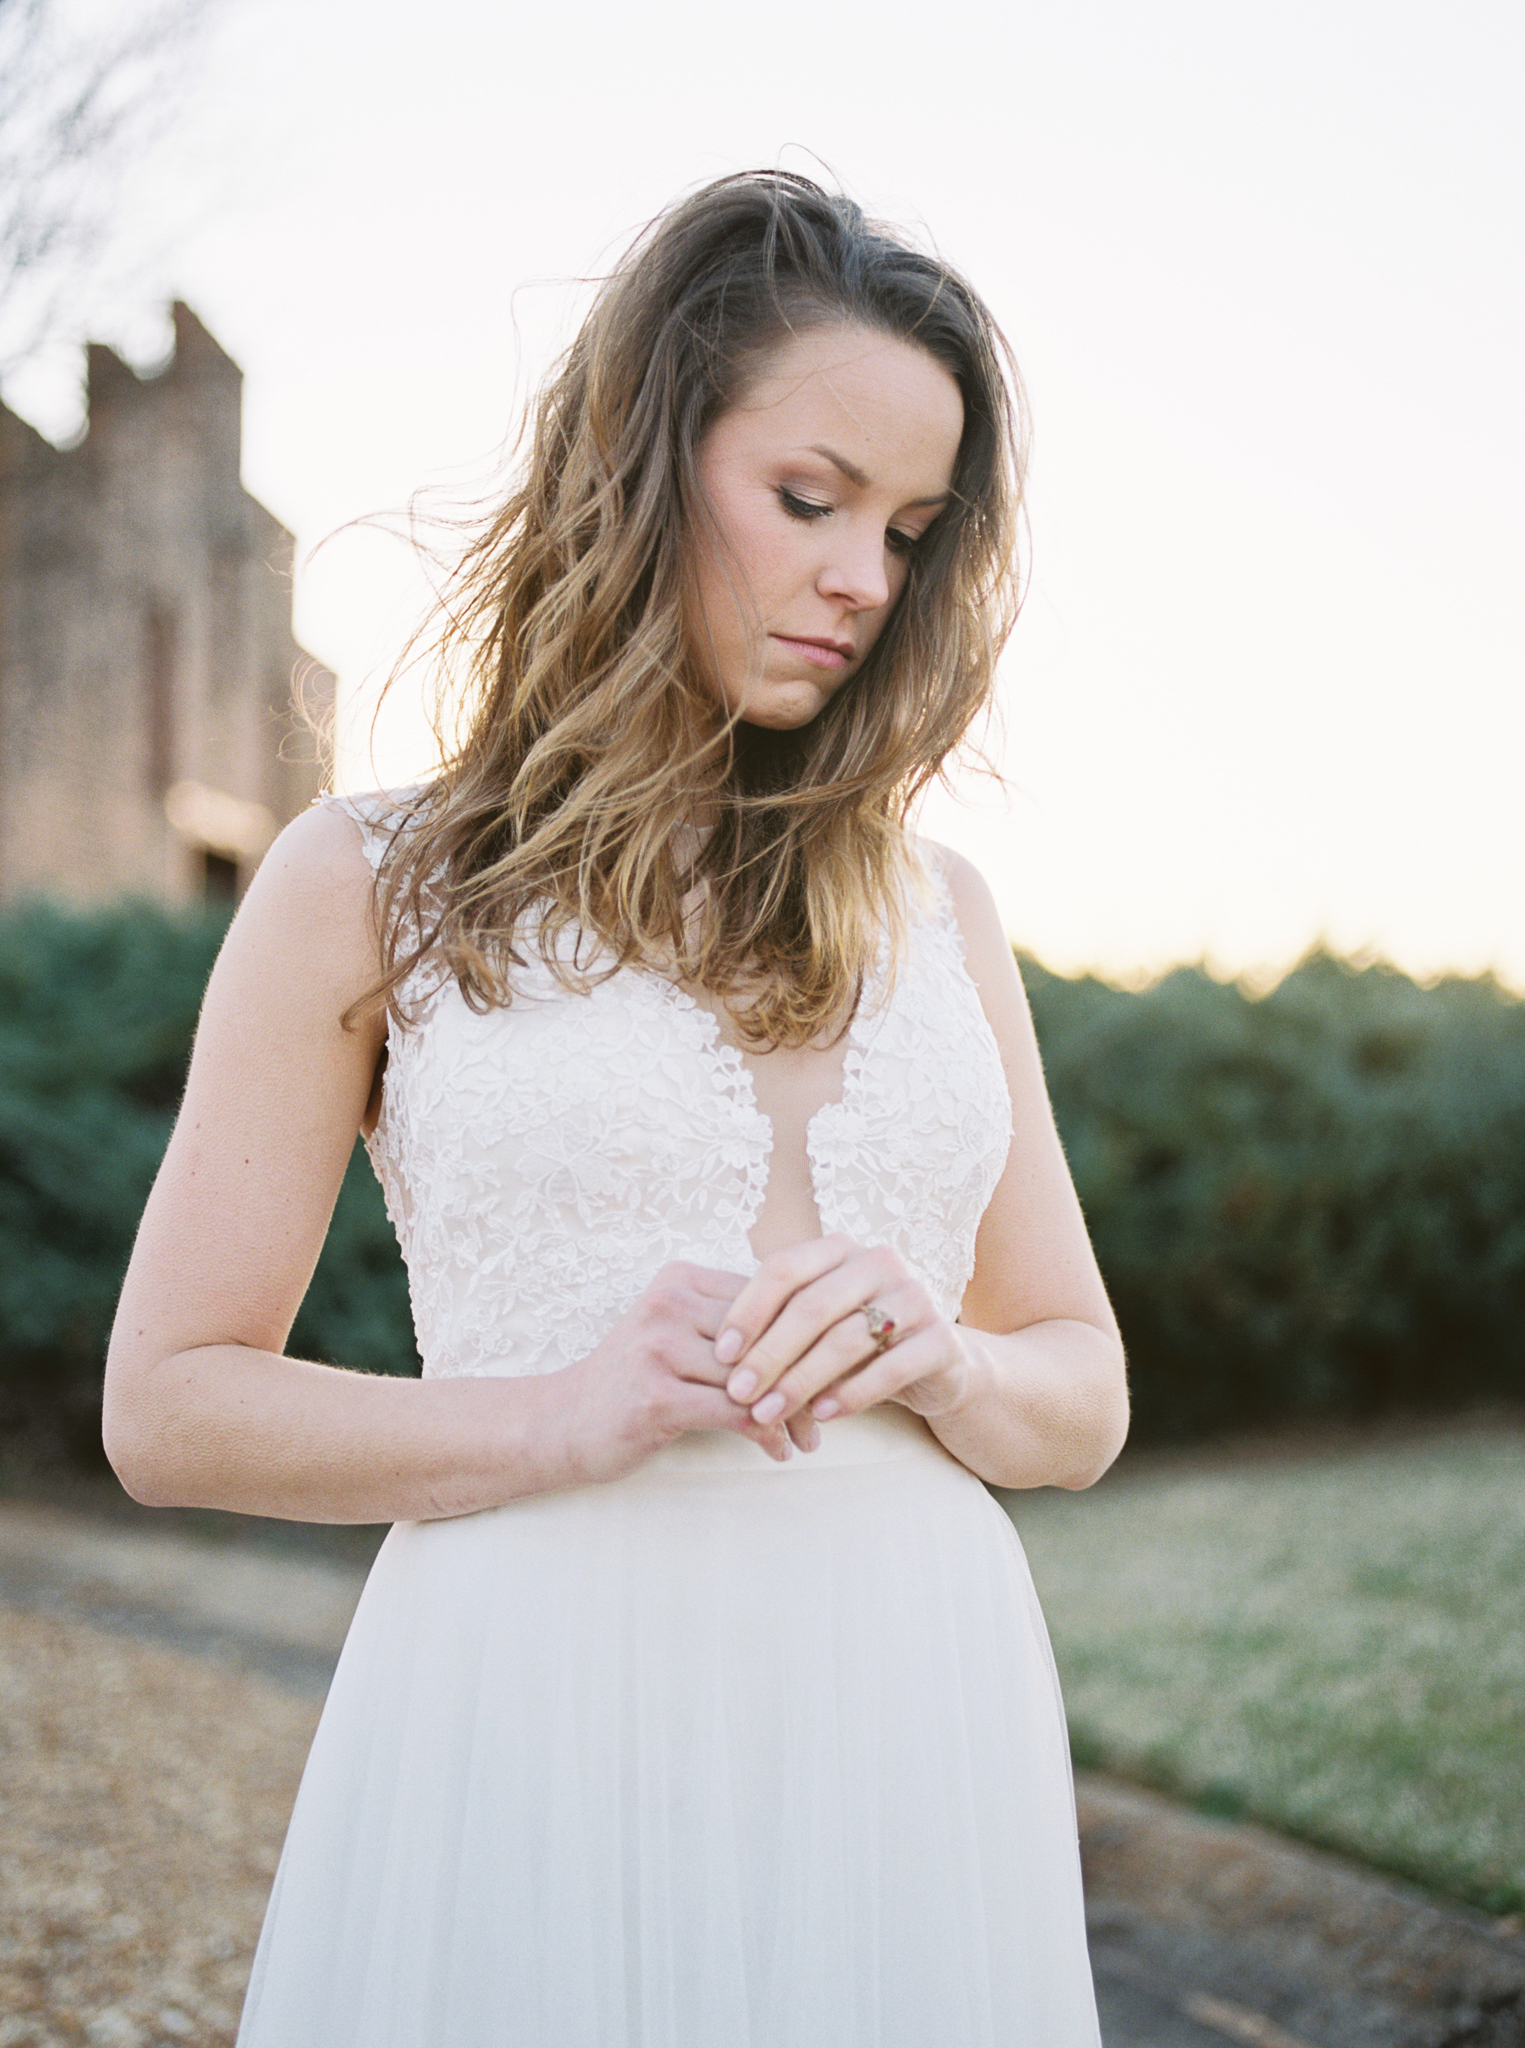 christinadavis+weddinginspiration53.jpg